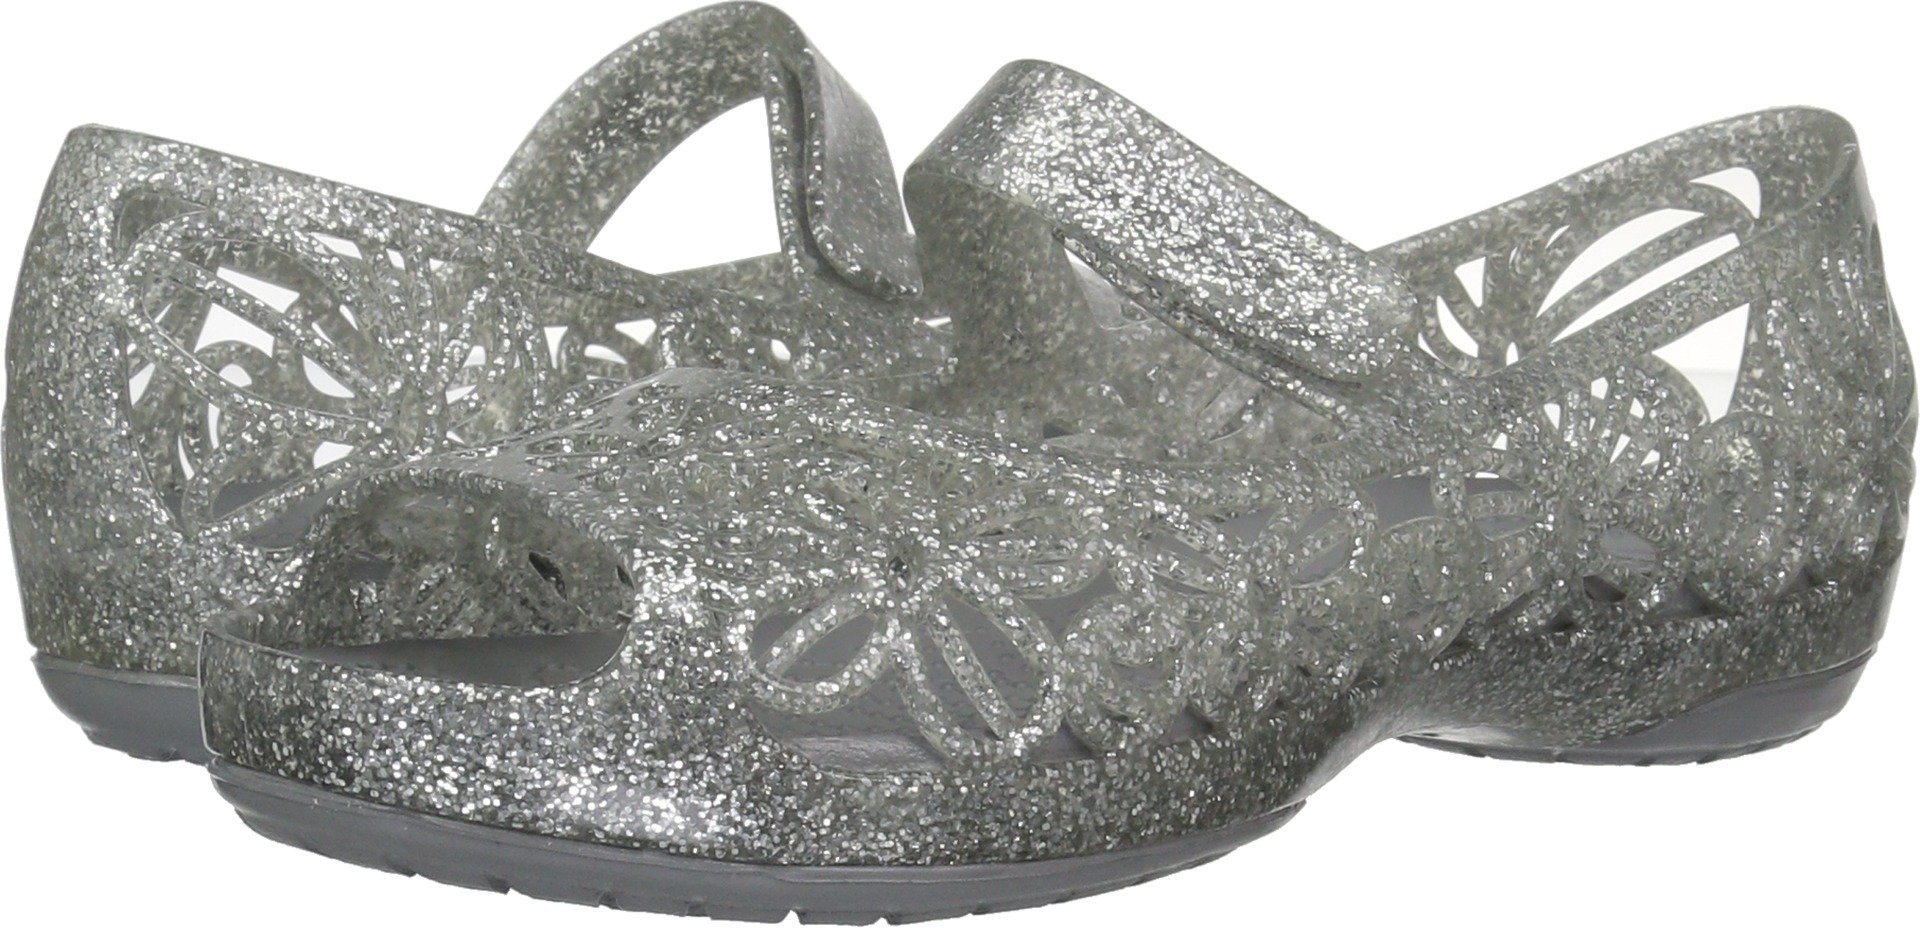 Crocs Girls' Isabella Glitter Ps Ballet Flat, Silver, 11 M US Little Kid